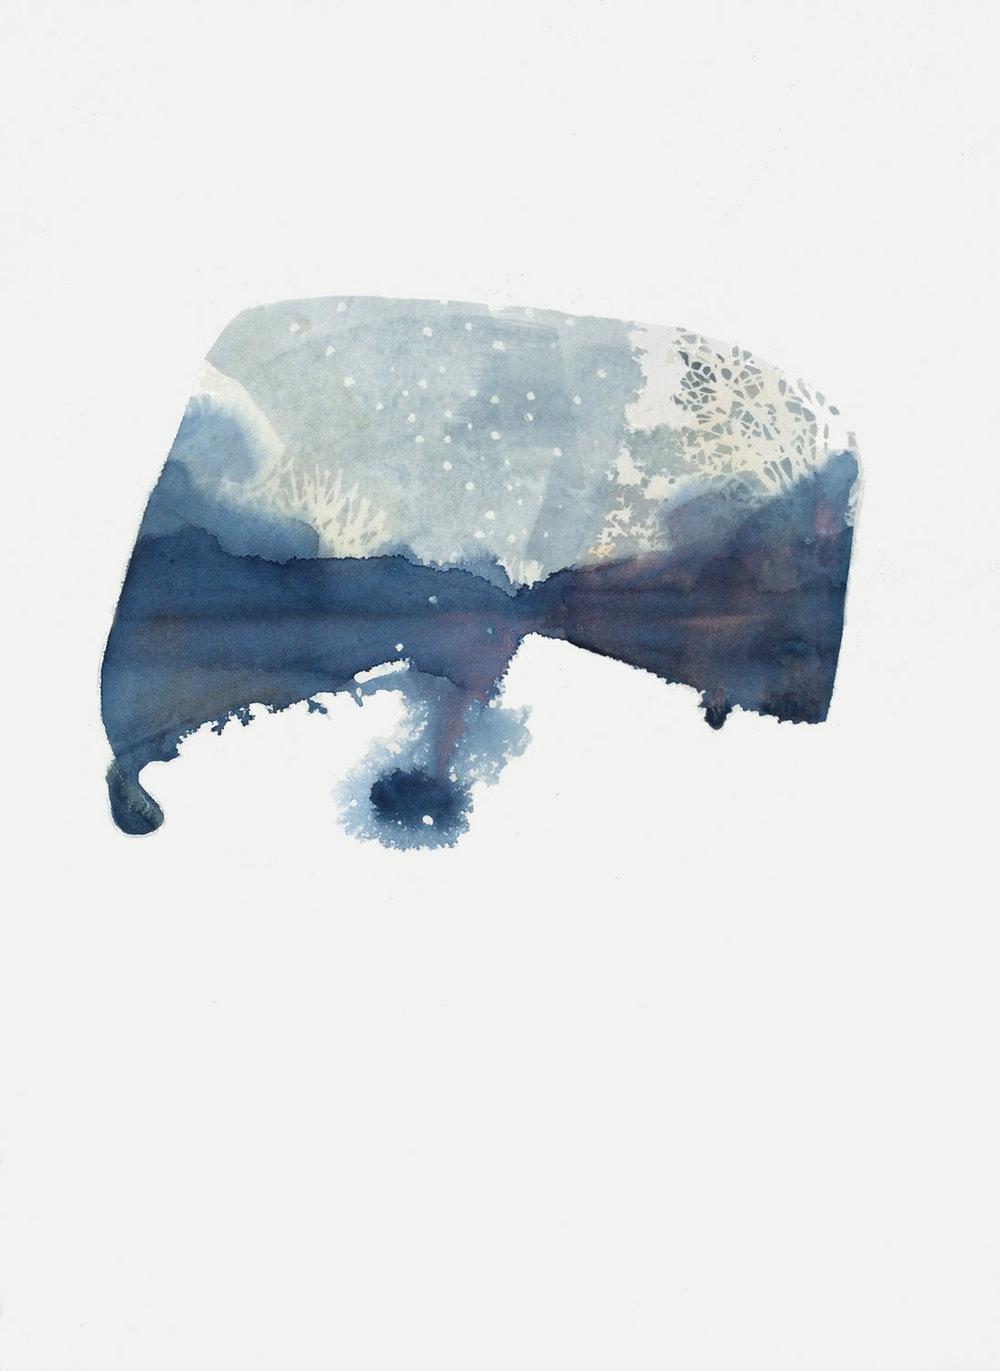 SnowatBlueLakeCalderaweb.jpg